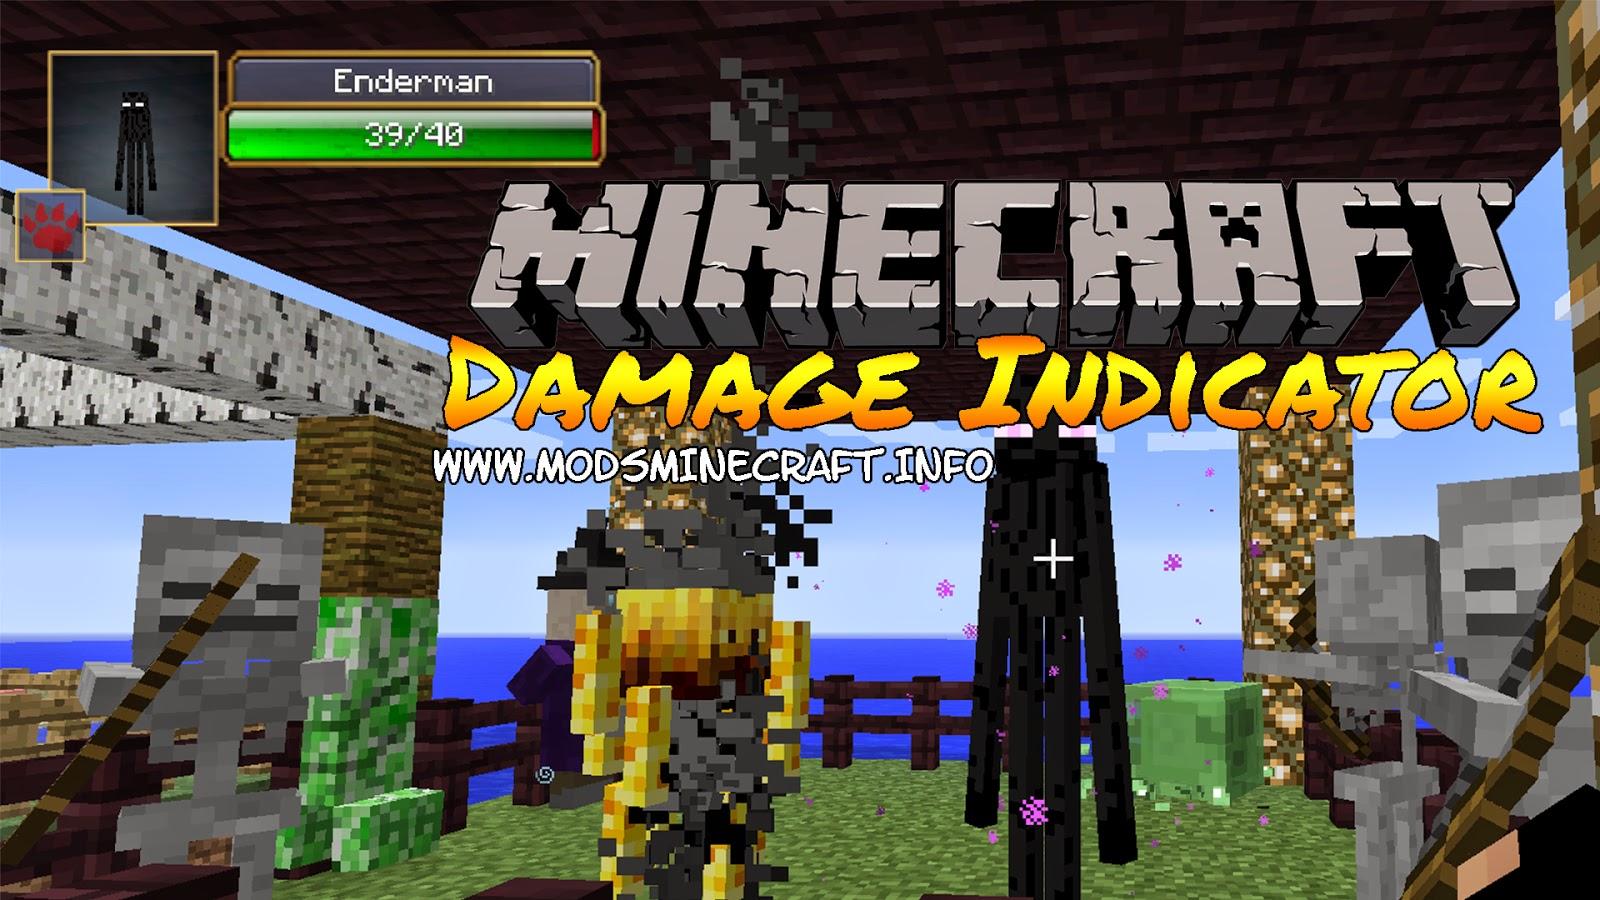 Damage Indicators Mod para Minecraft 1.7.2, Damage Indicators Mod, Damage Indicators 1.7.2, minecraft Damage Indicators Mod, minecraft Damage Indicators 1.7.2, minecraft mod para indicar el daño, minecraft 1.7.2, minecraft mods 1.7.2, minecraft descargar mods 1.7.2, minecraft mods, mods minecraft, cómo instalar mods, cómo instalar mods minecraft, minecraft cómo instalar mods